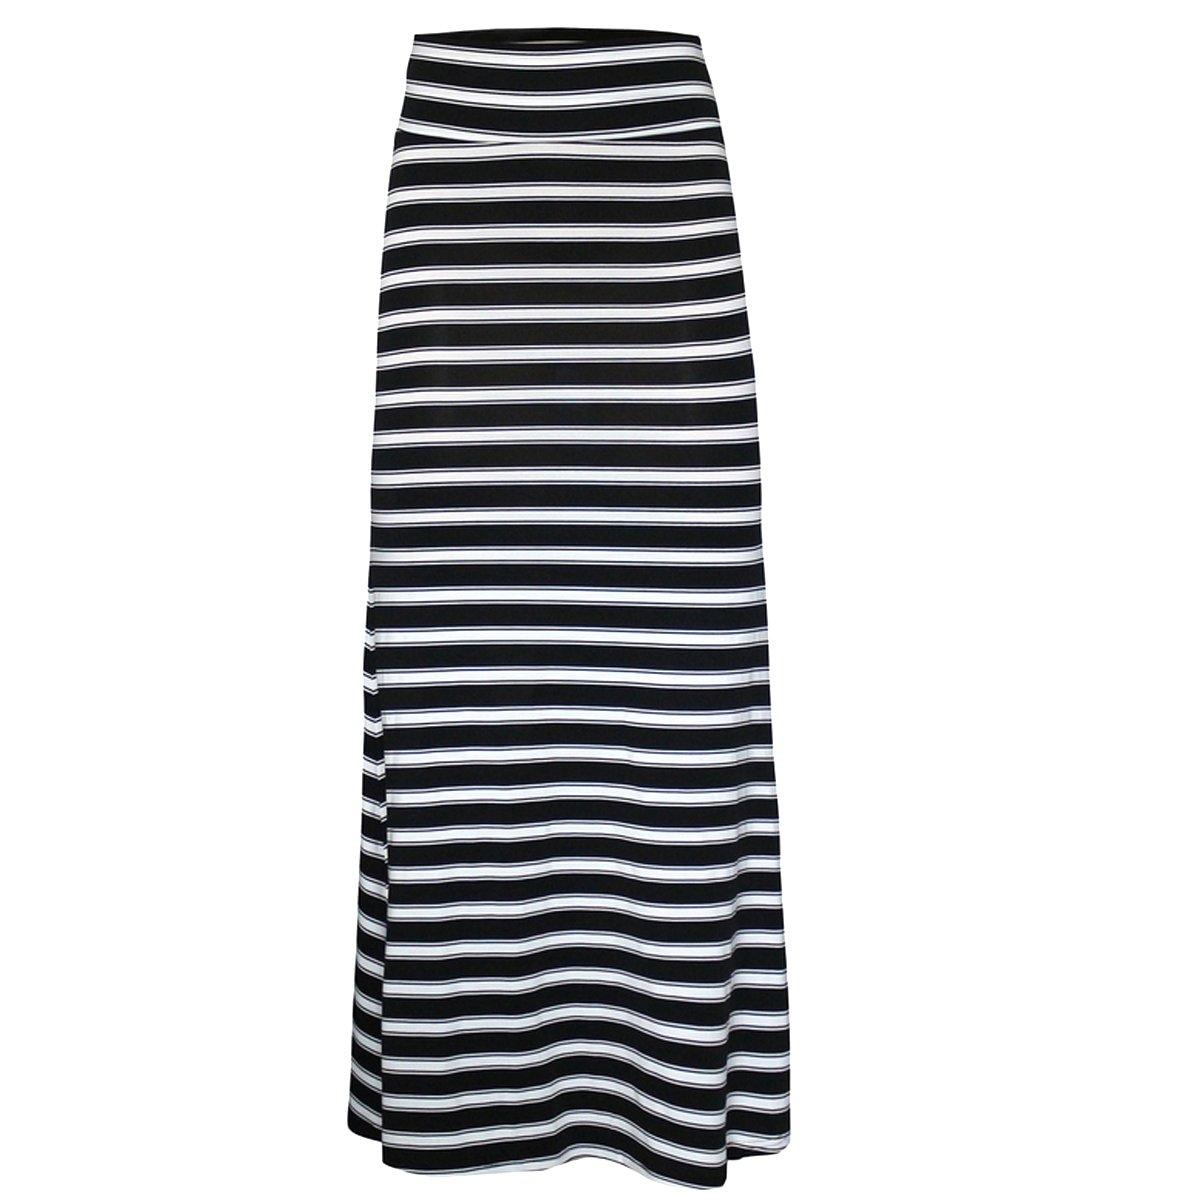 56244093a3 Editha Women Floral Print Maxi Long Skirt High Elastic Waist Slim Full Skirt  Summer Foldover Skirts Black Stripes M at Amazon Women's Clothing store: